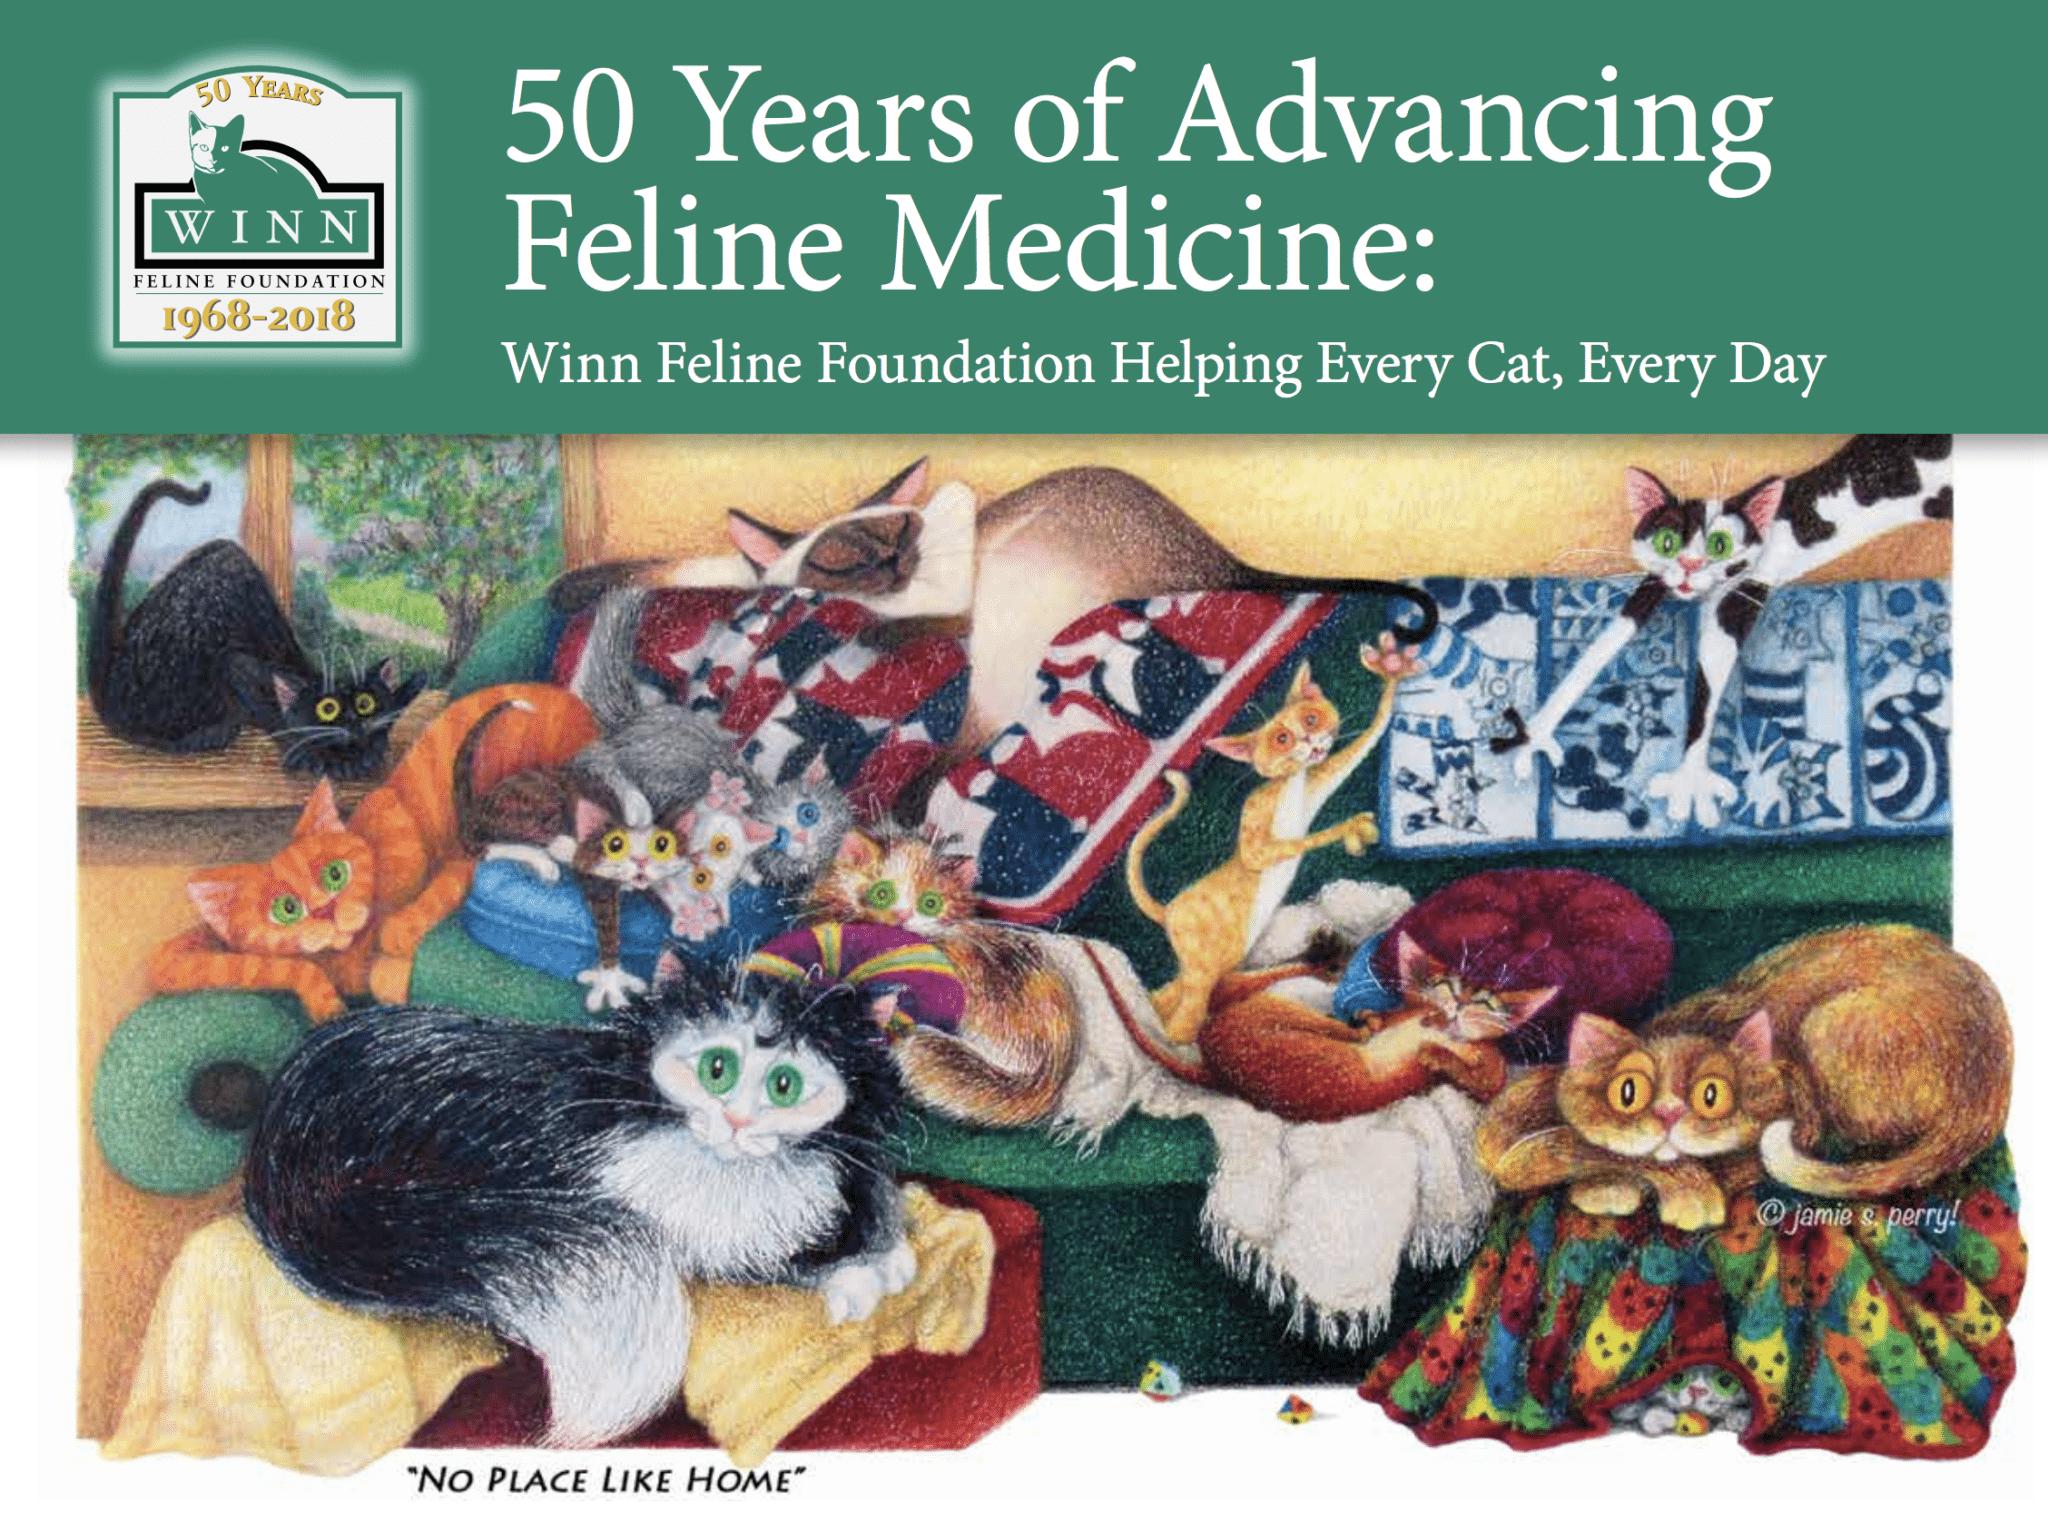 Winn Feline Foundation celebrates 50 years in fashion